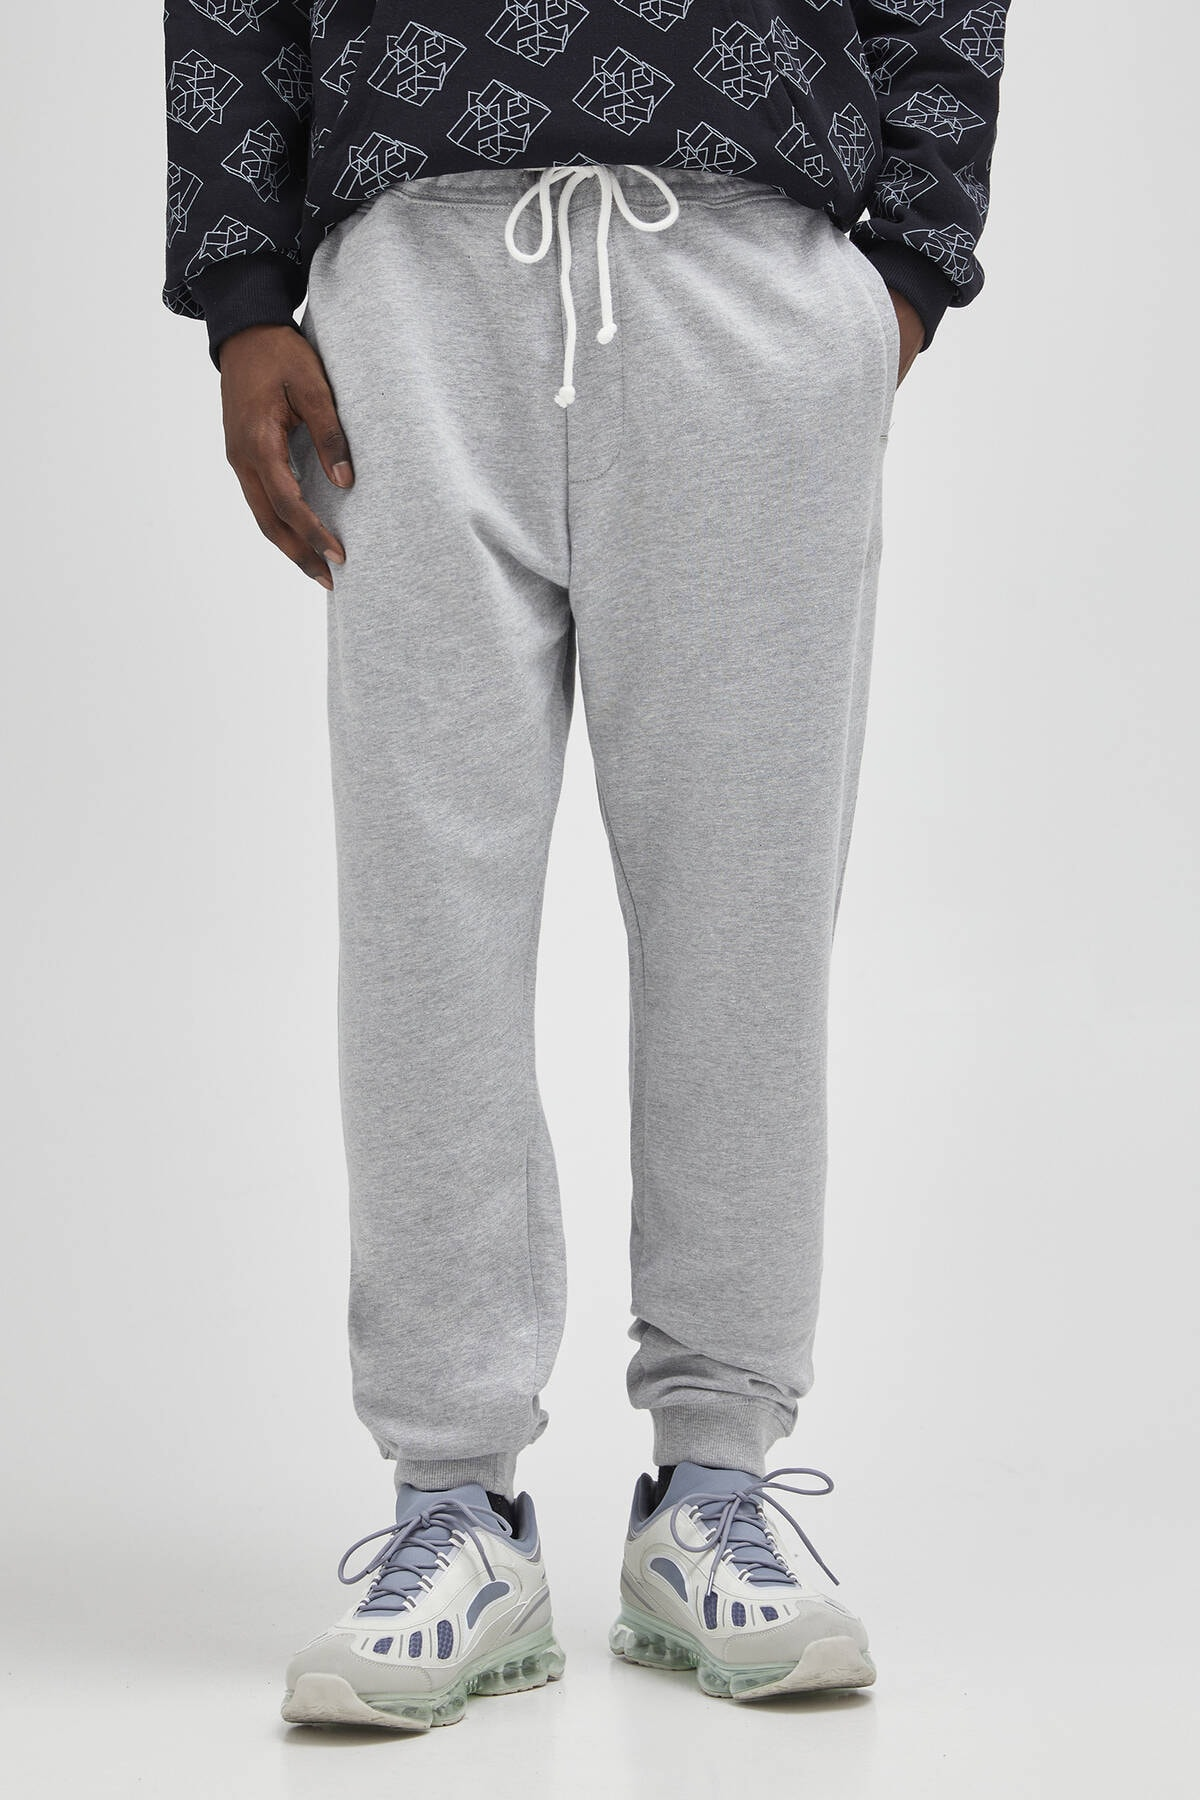 Pull & Bear Erkek Açık Gri Renkli Jogging Fit Pantolon 04676513 1